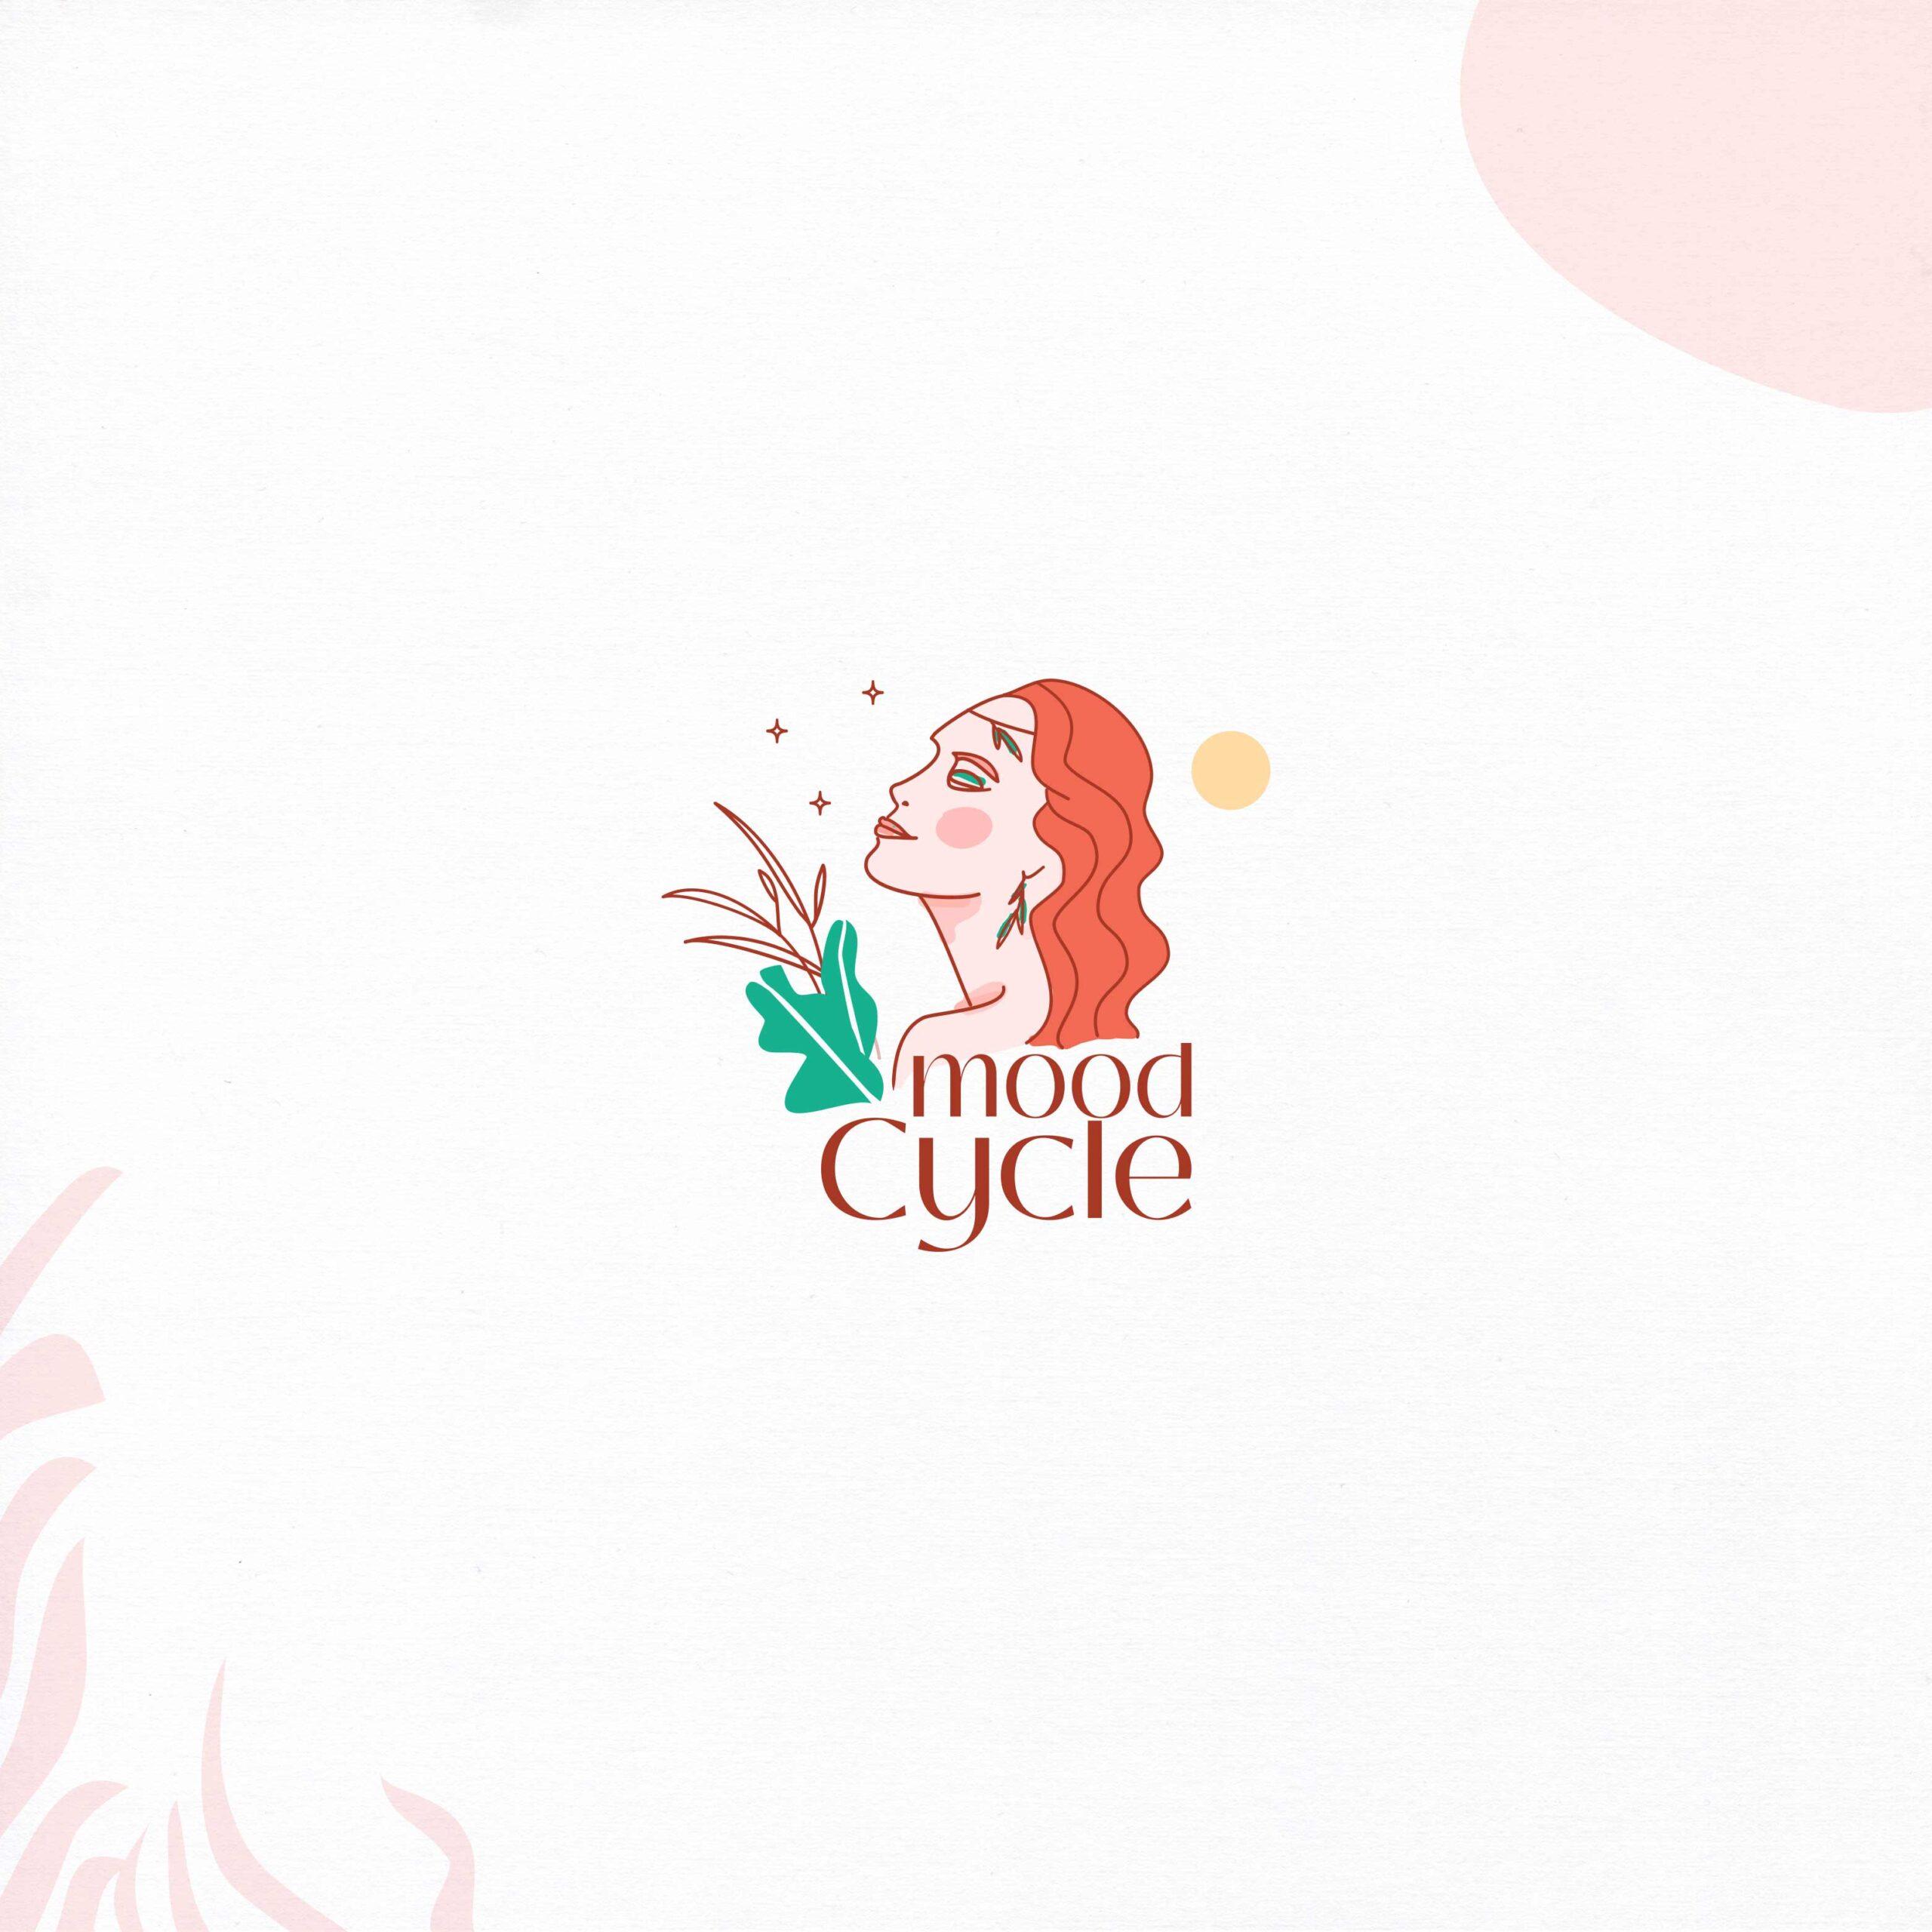 Mood-Cycle-Portfolio-3